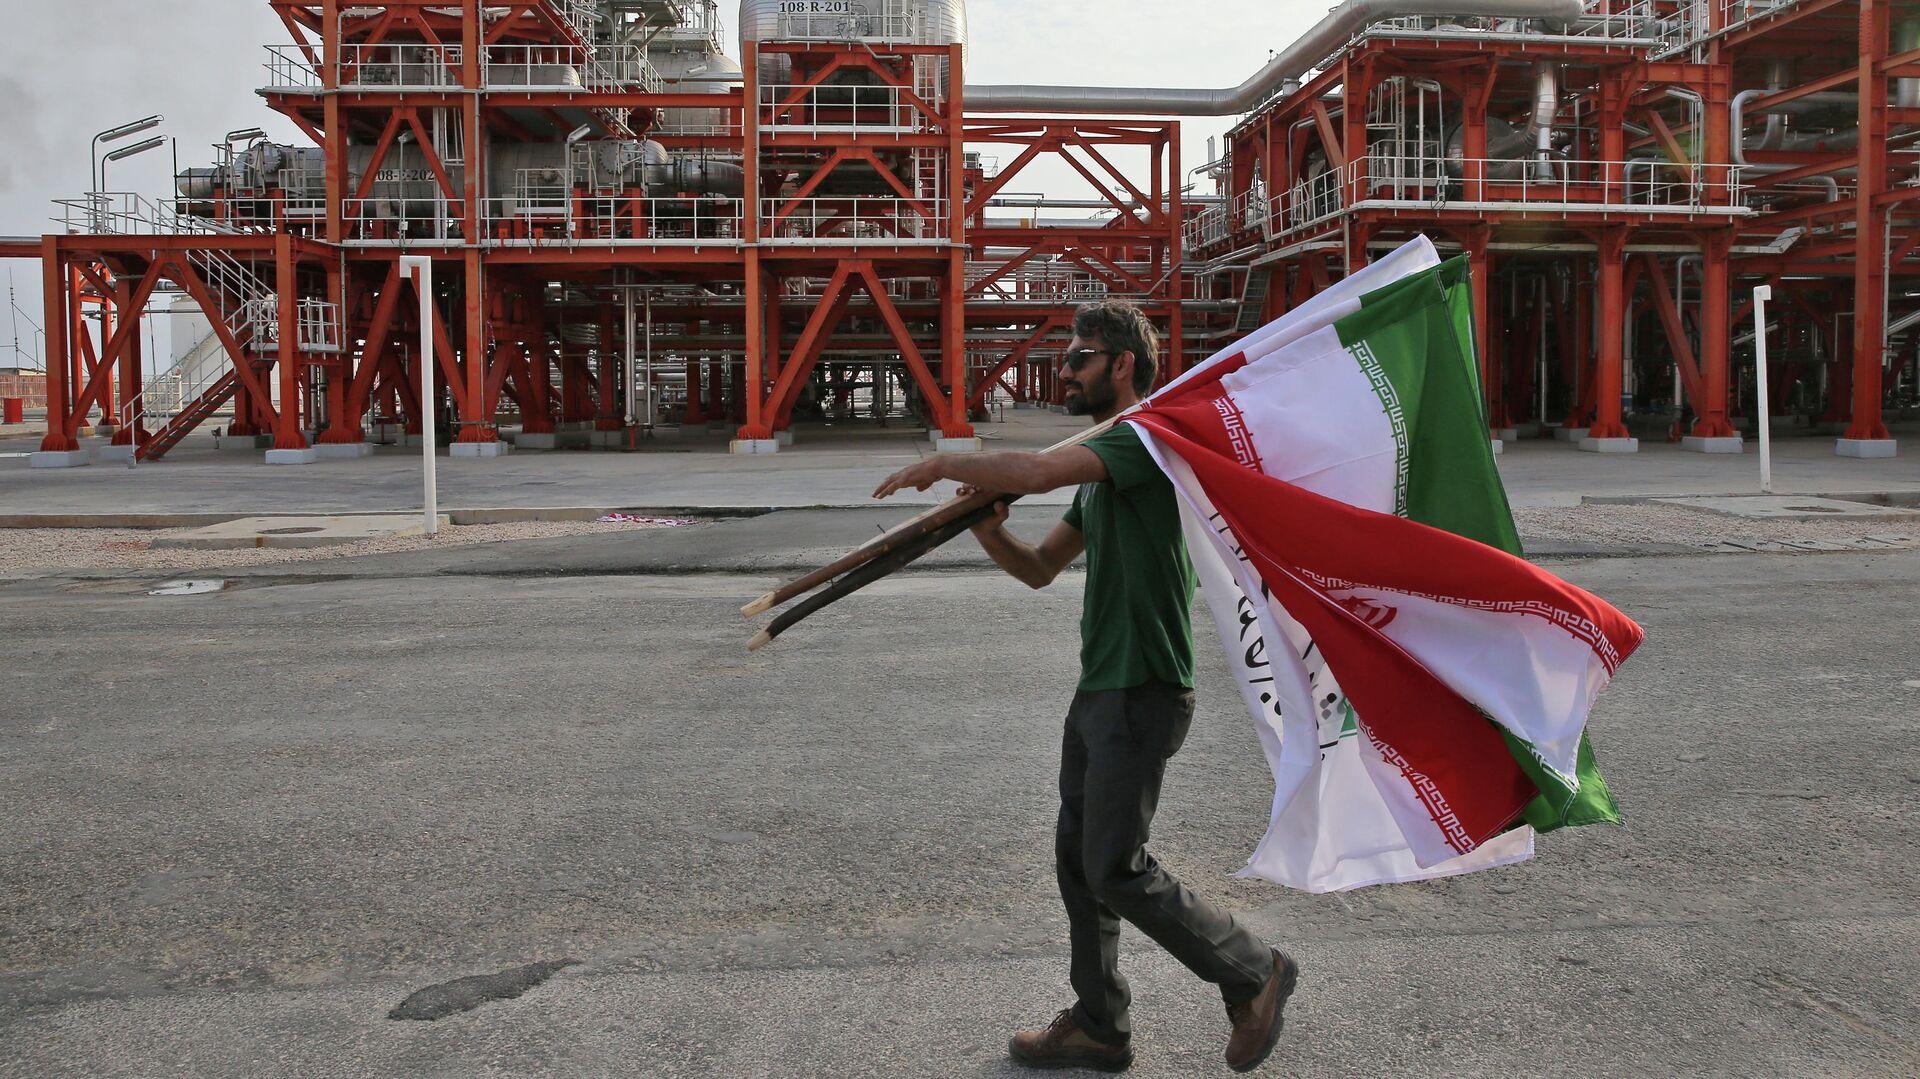 Мужчина с флагами Ирана на заводе по переработке природного газа - РИА Новости, 1920, 06.04.2021